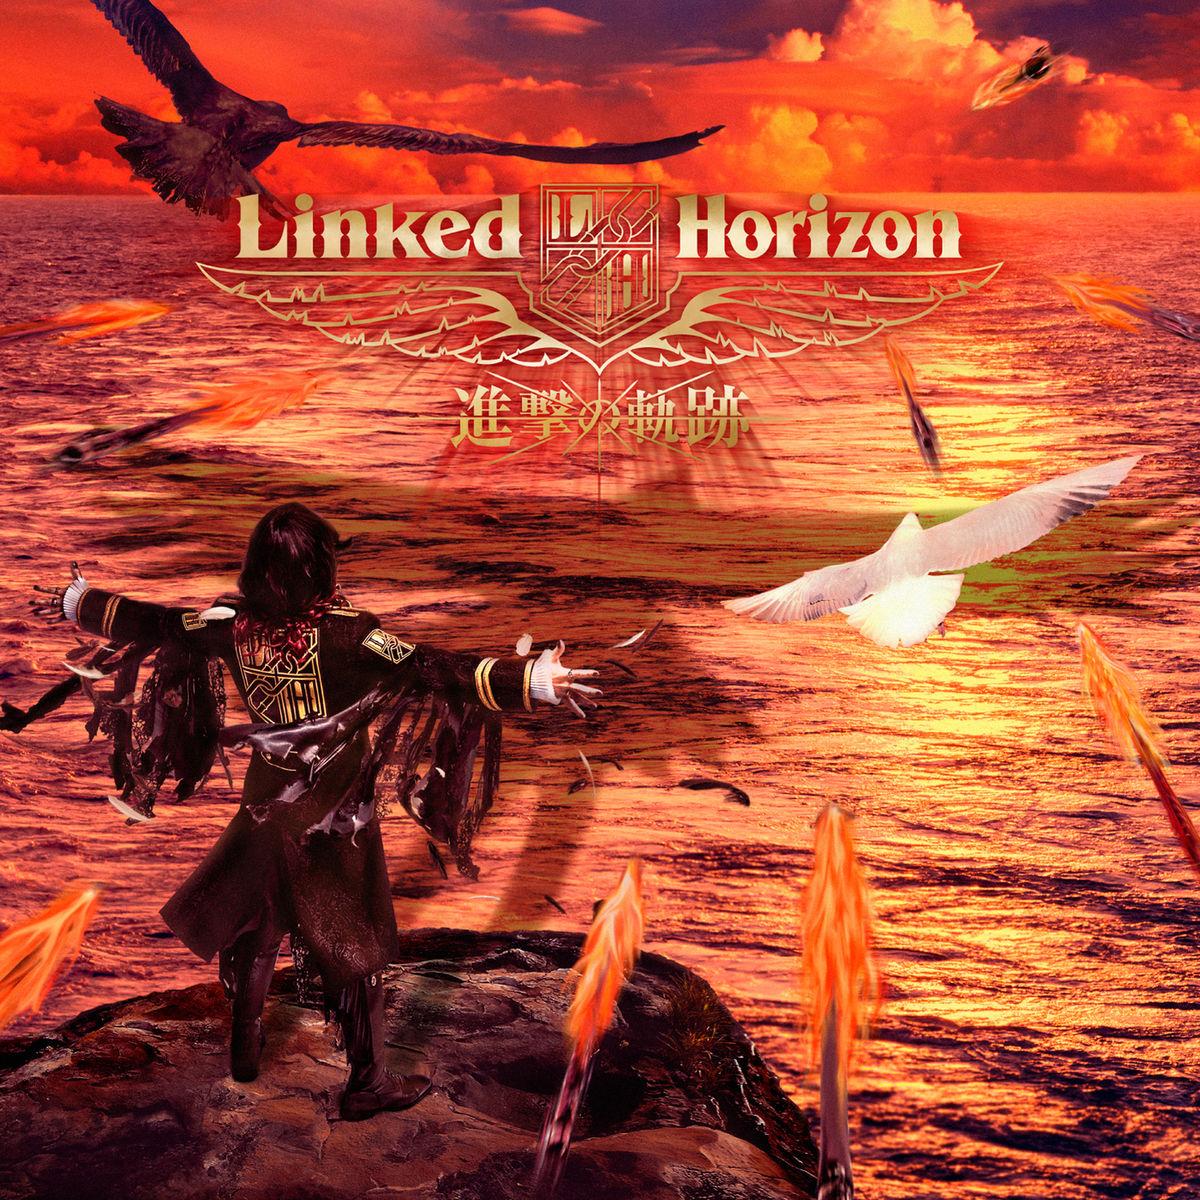 『Linked Horizon - 彼女は冷たい棺の中で』収録の『進撃の軌跡』ジャケット